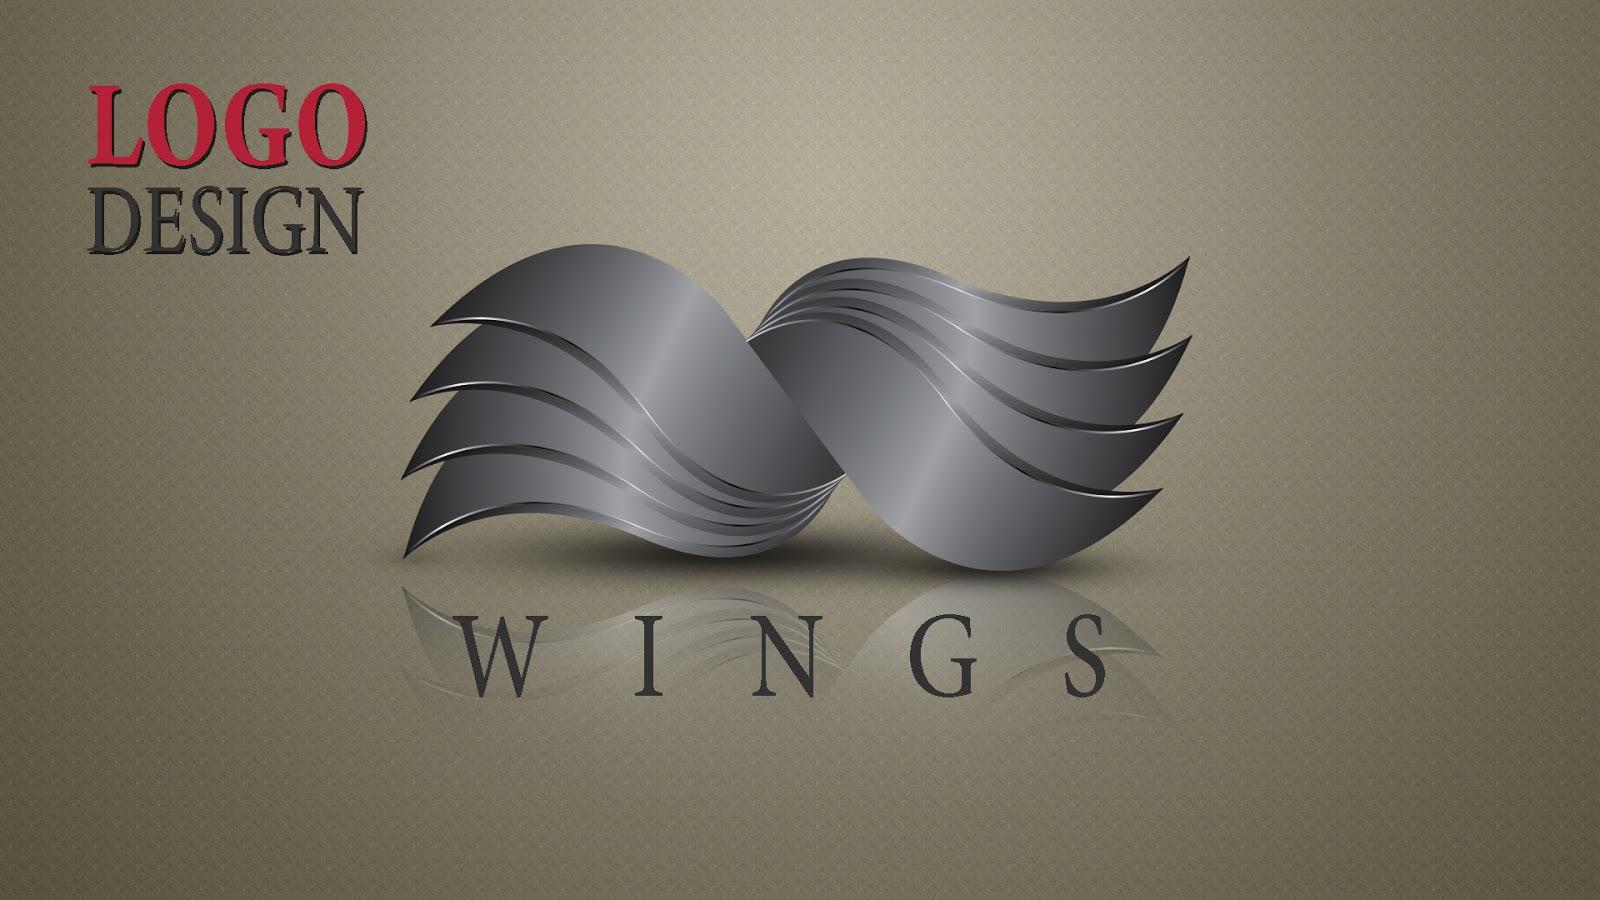 3d logo design tutorial in illustrator and Photoshop - sahak graphics